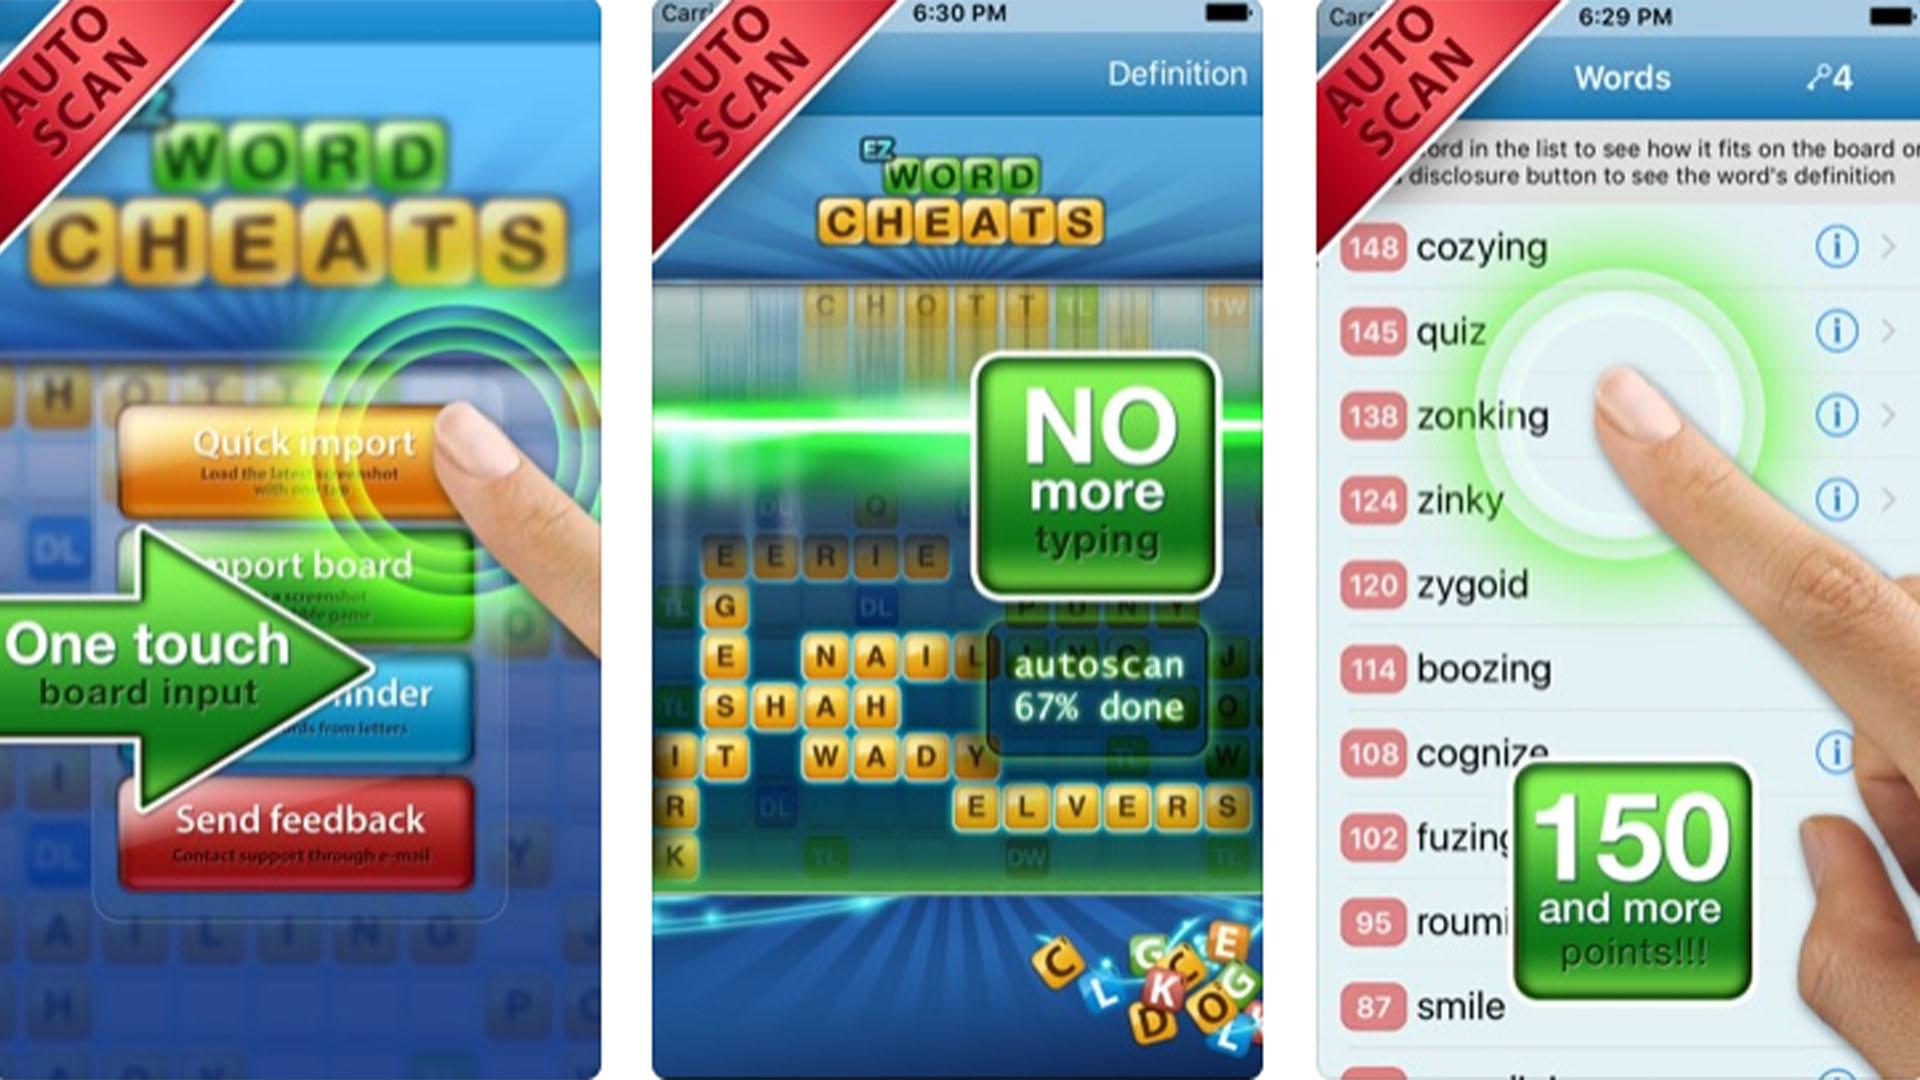 Words with EZ Cheat App Store screenshot